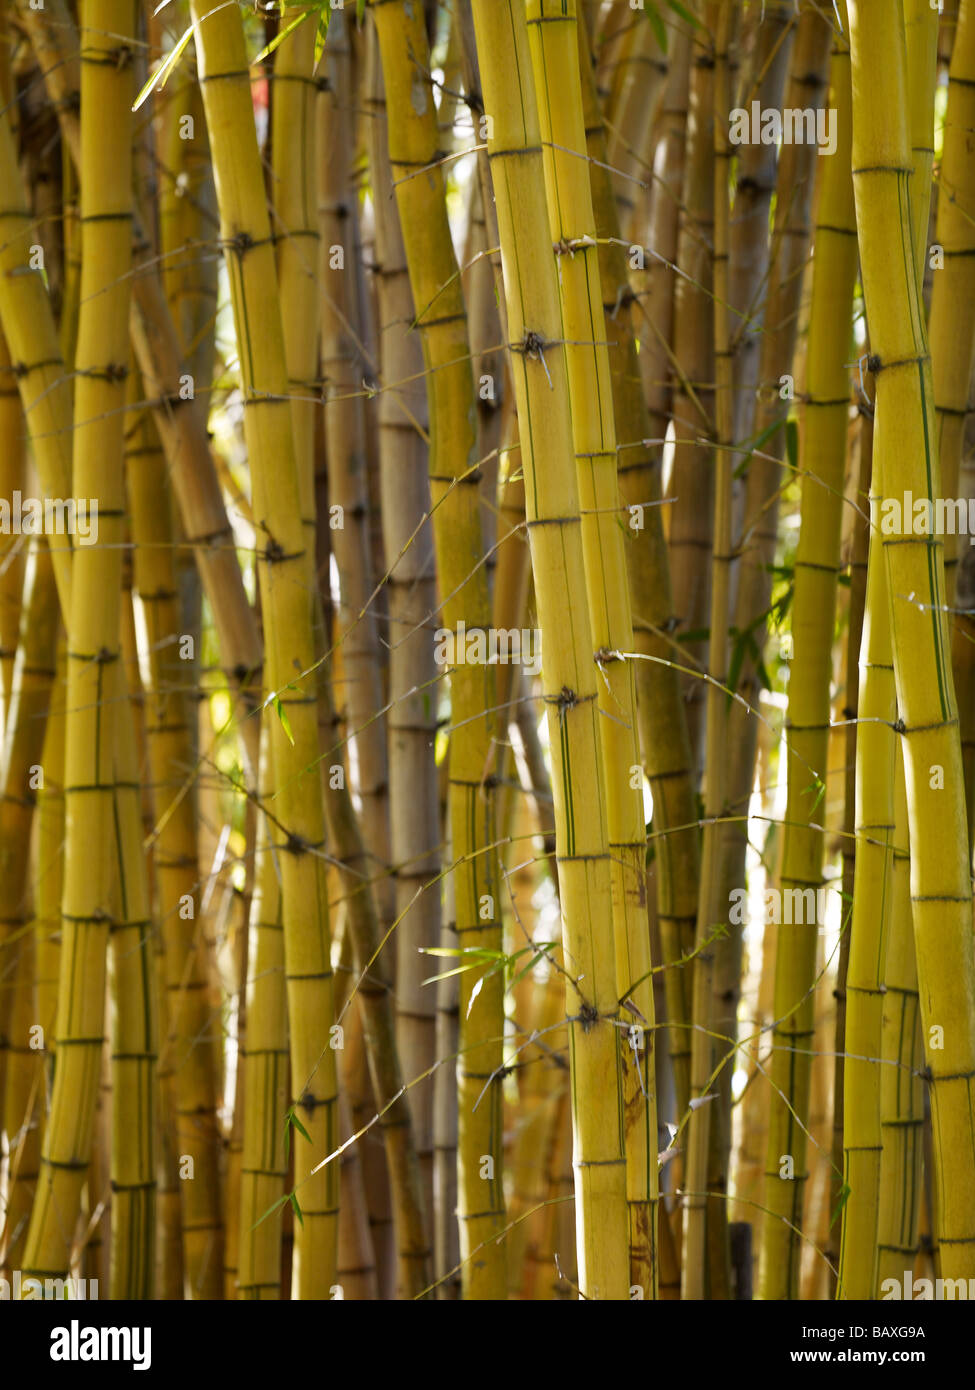 Grove of bamboo - Stock Image